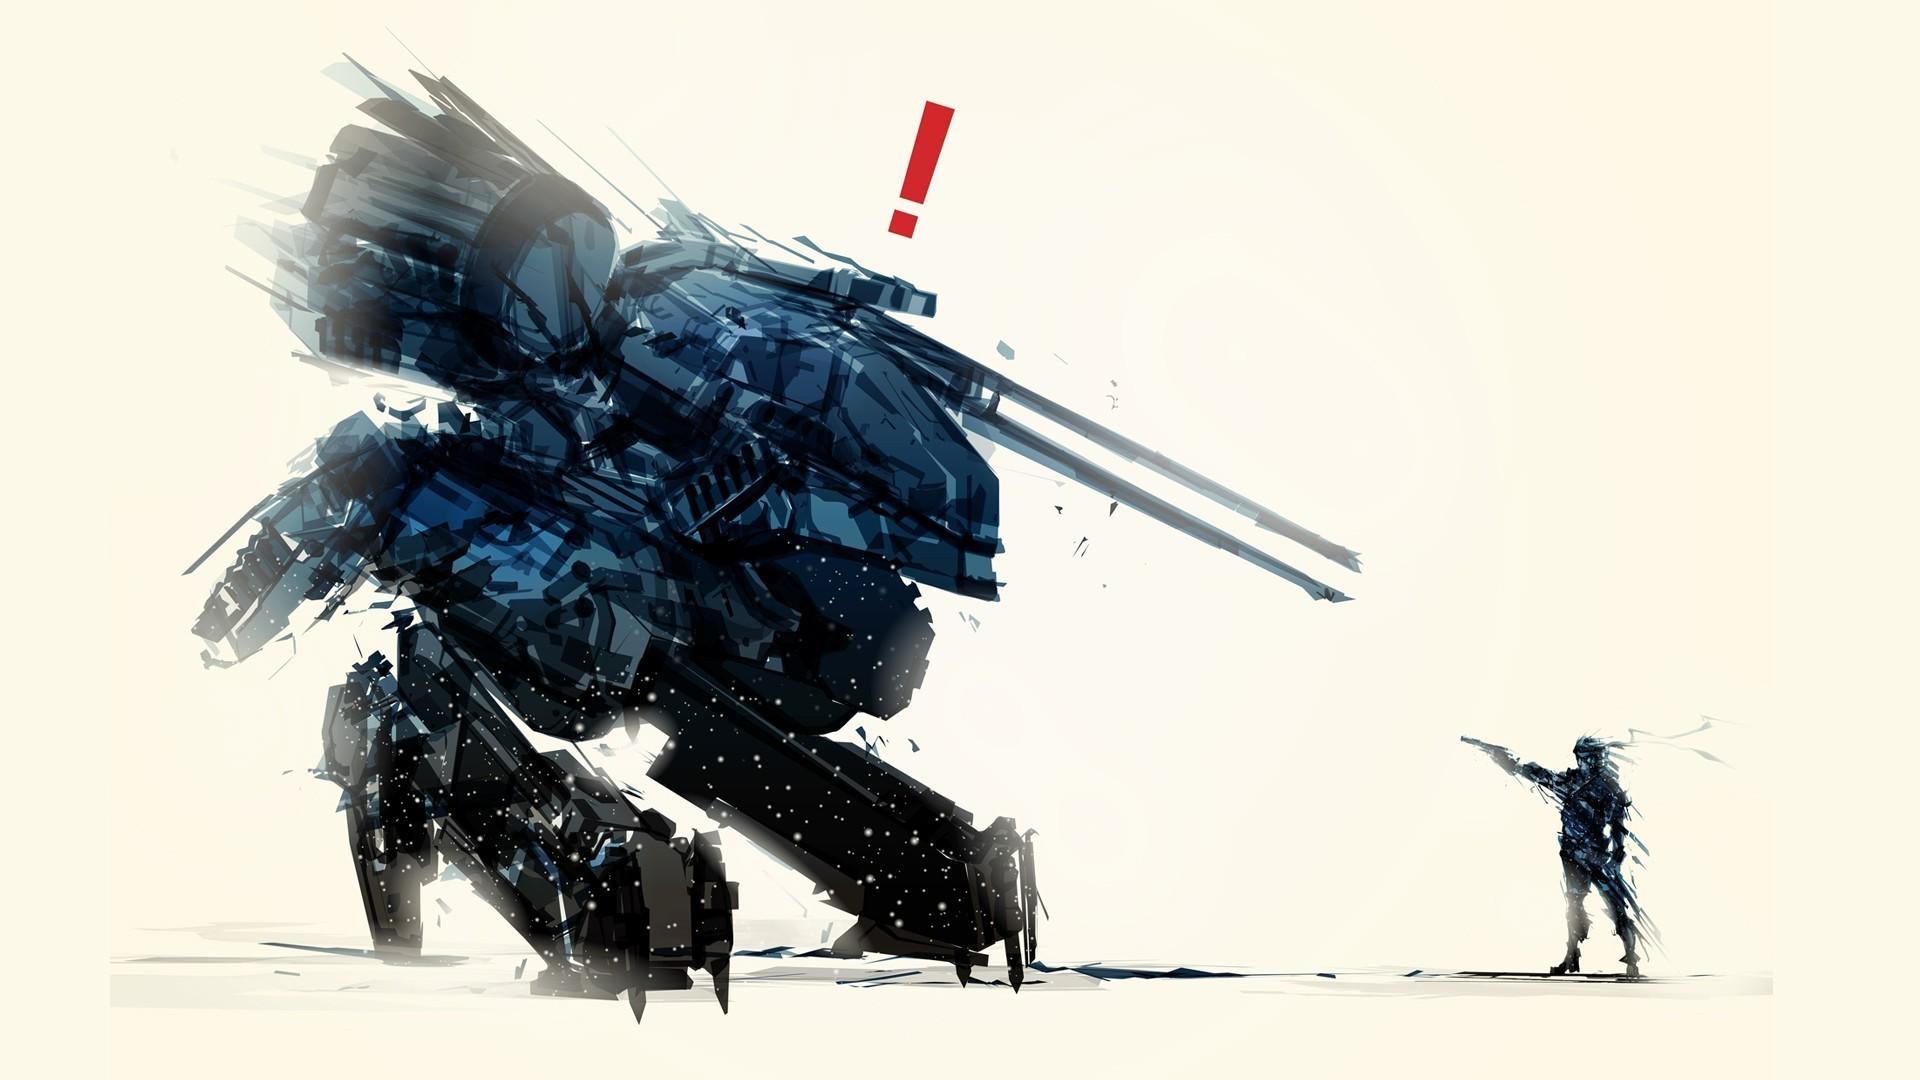 Metal Gear Solid Wallpaper 1080p 76 images